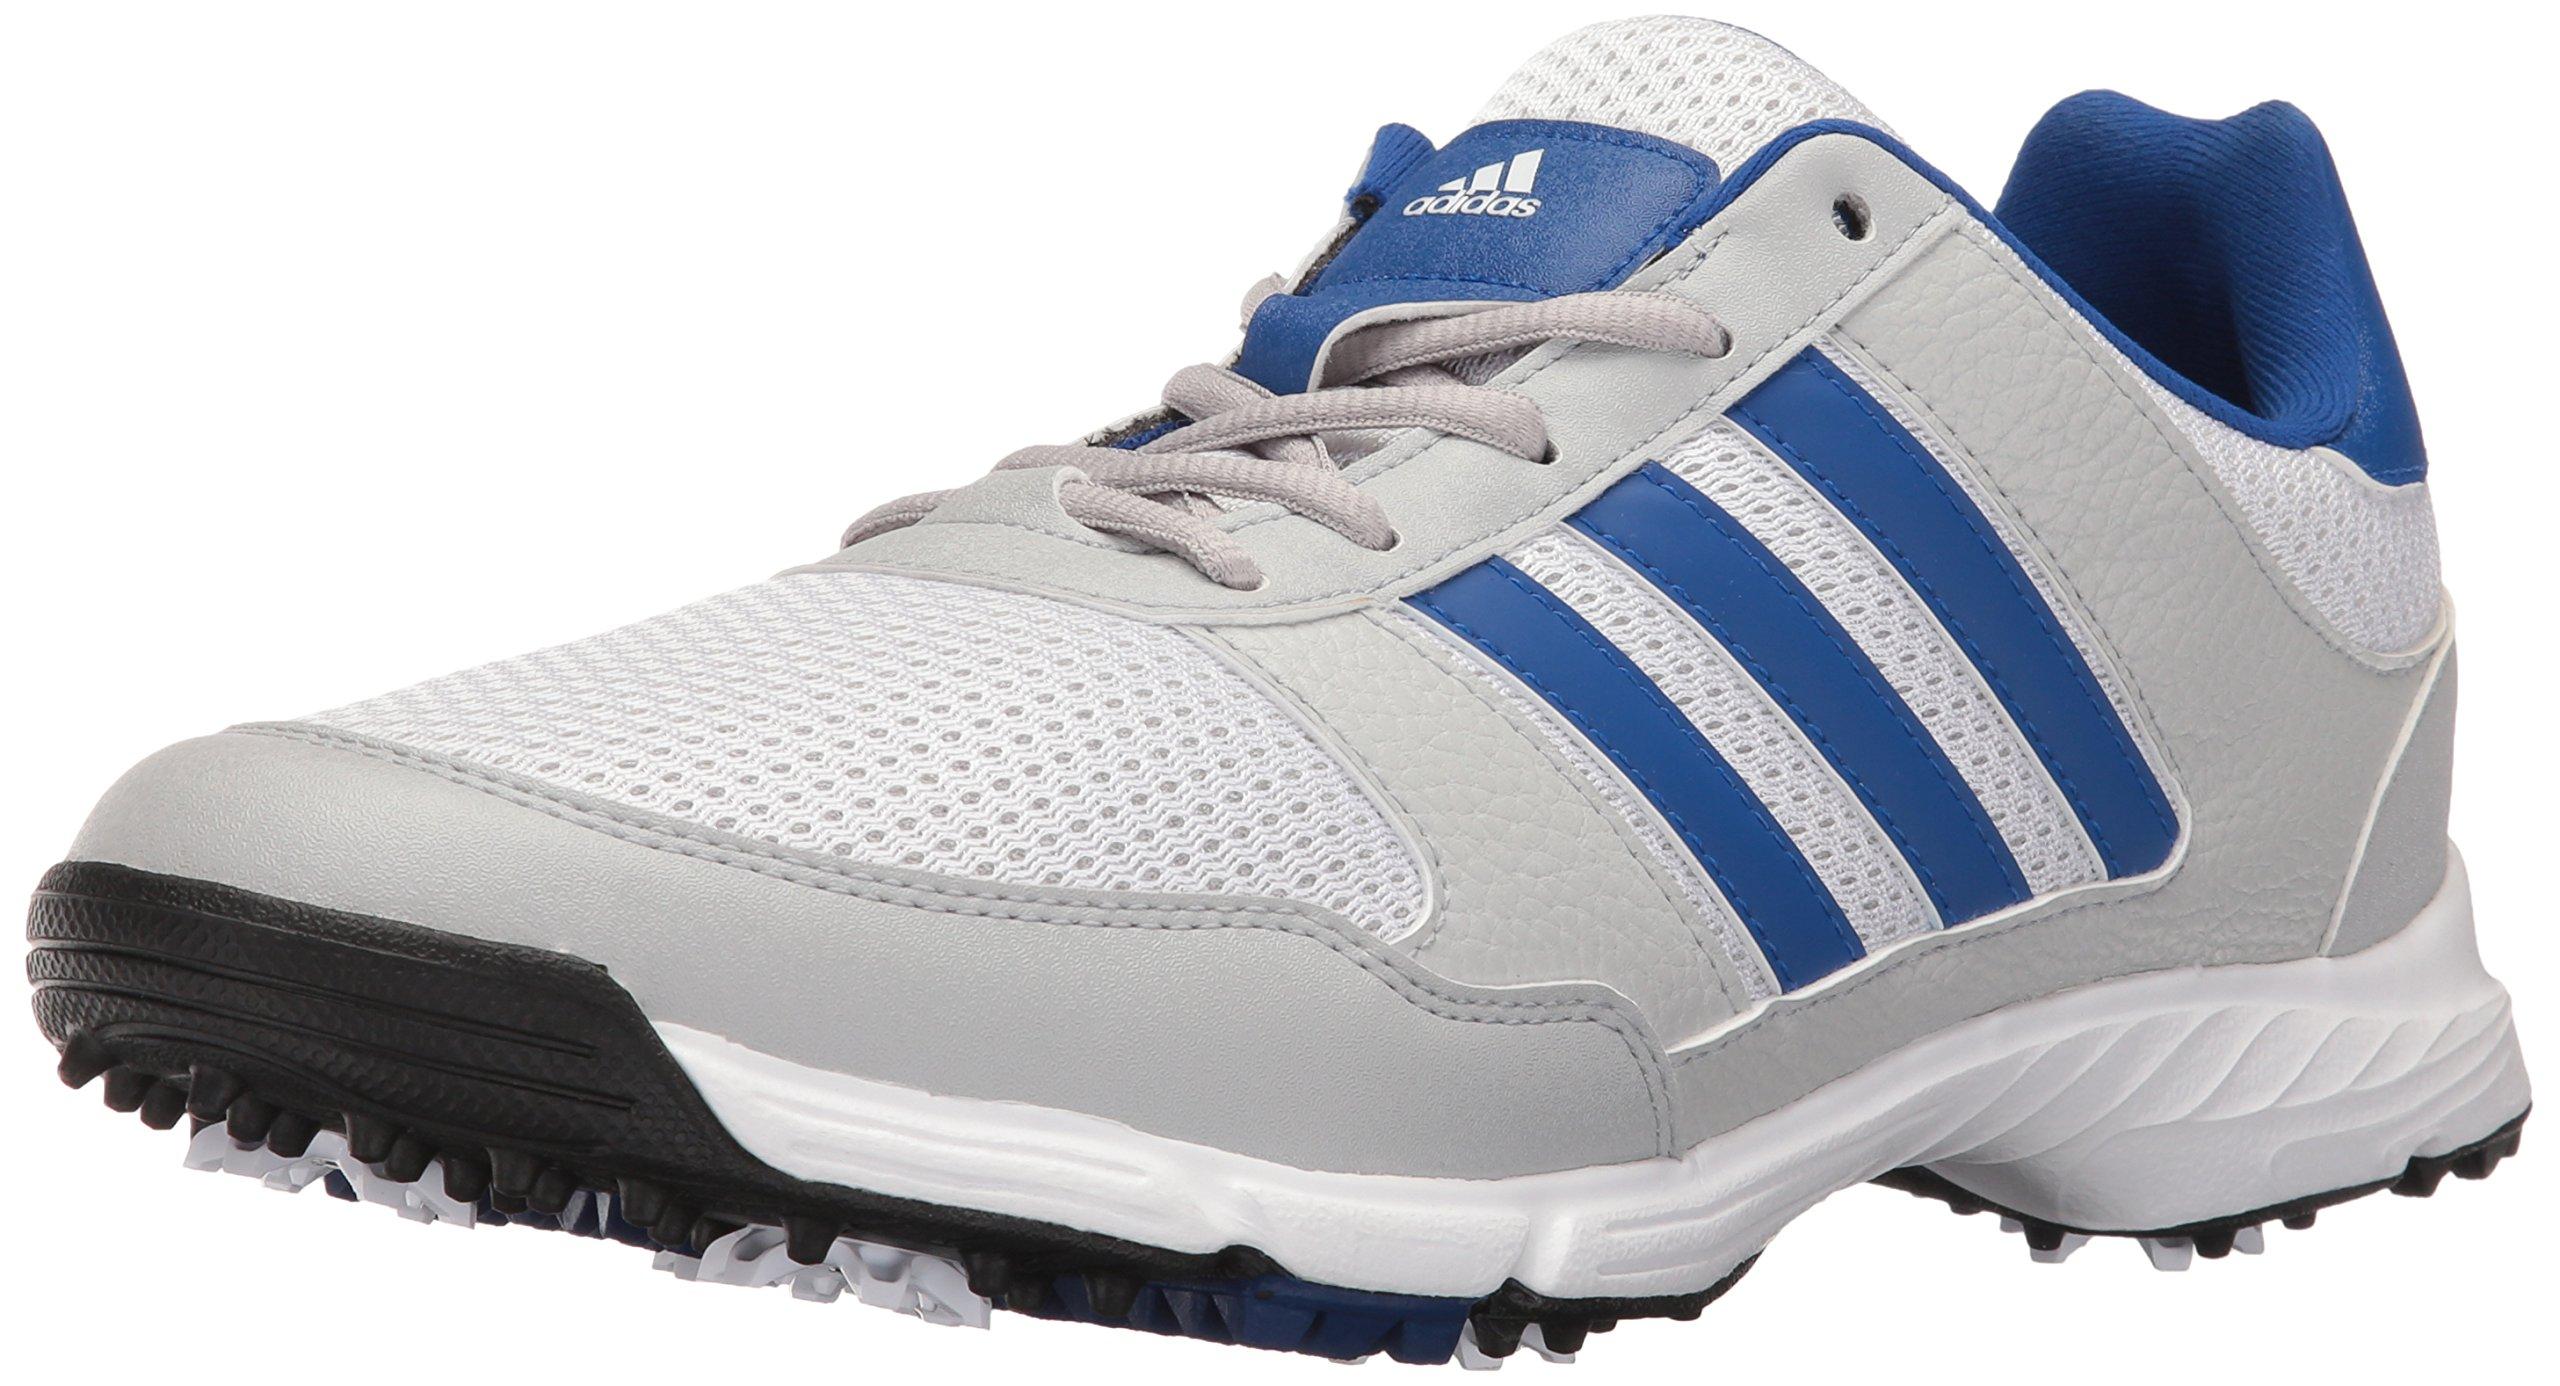 adidas Men's Tech Response 4.0 Golf Shoe, White/Royal, 13 M US by adidas